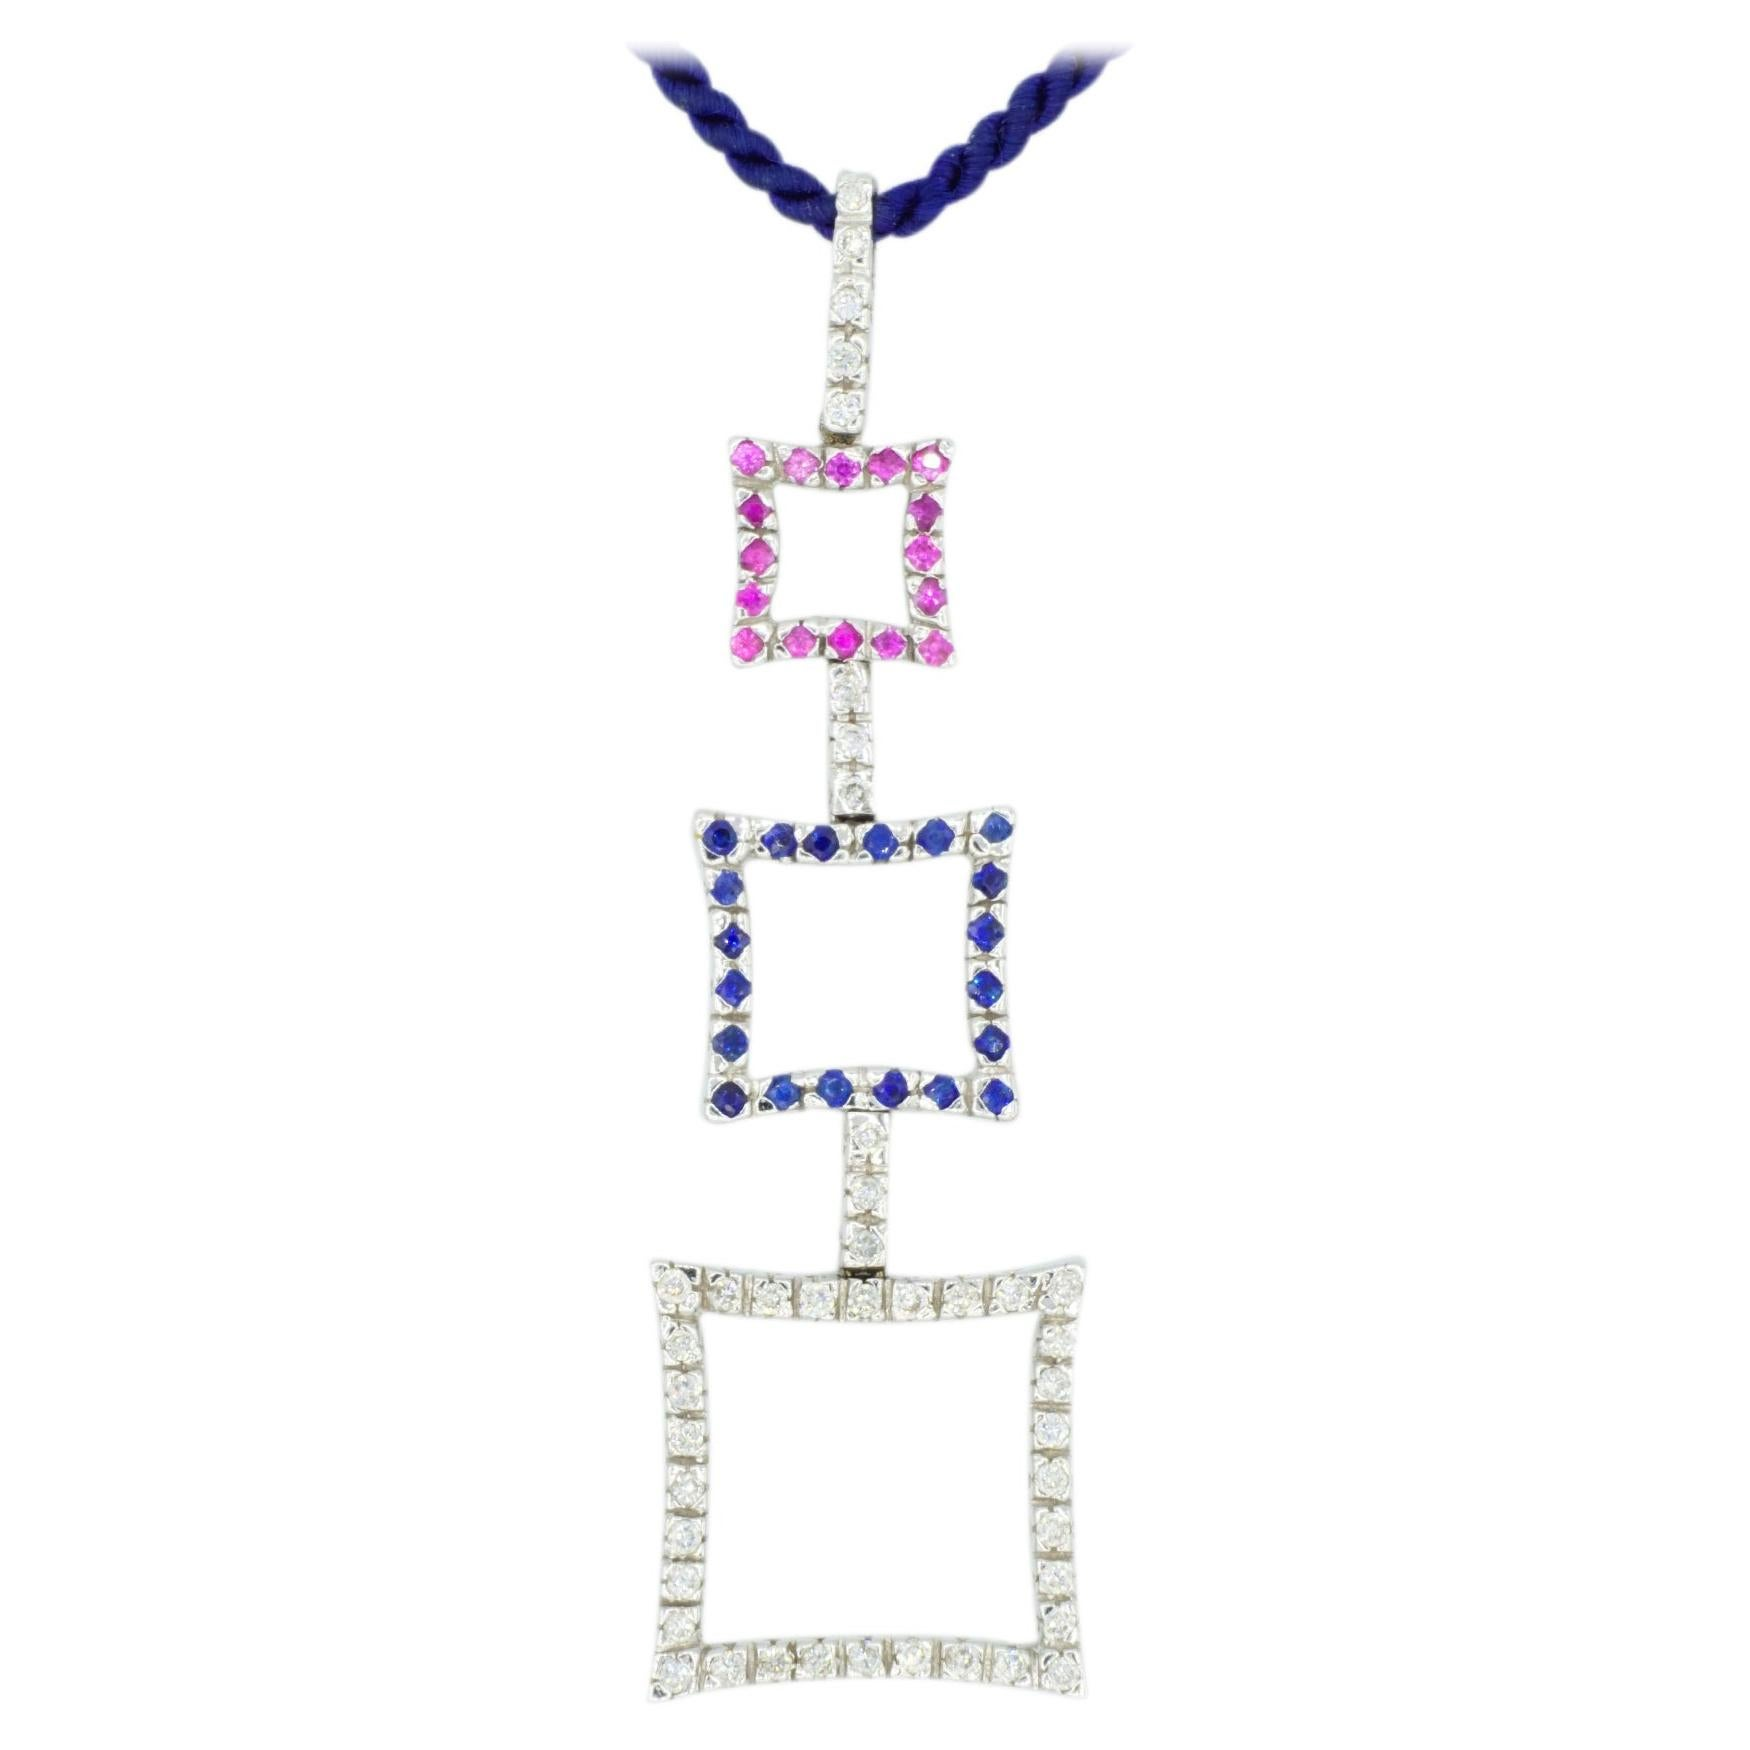 18 Karat White Gold White Sapphire, Pink Sapphire and Blue Sapphire Pendant